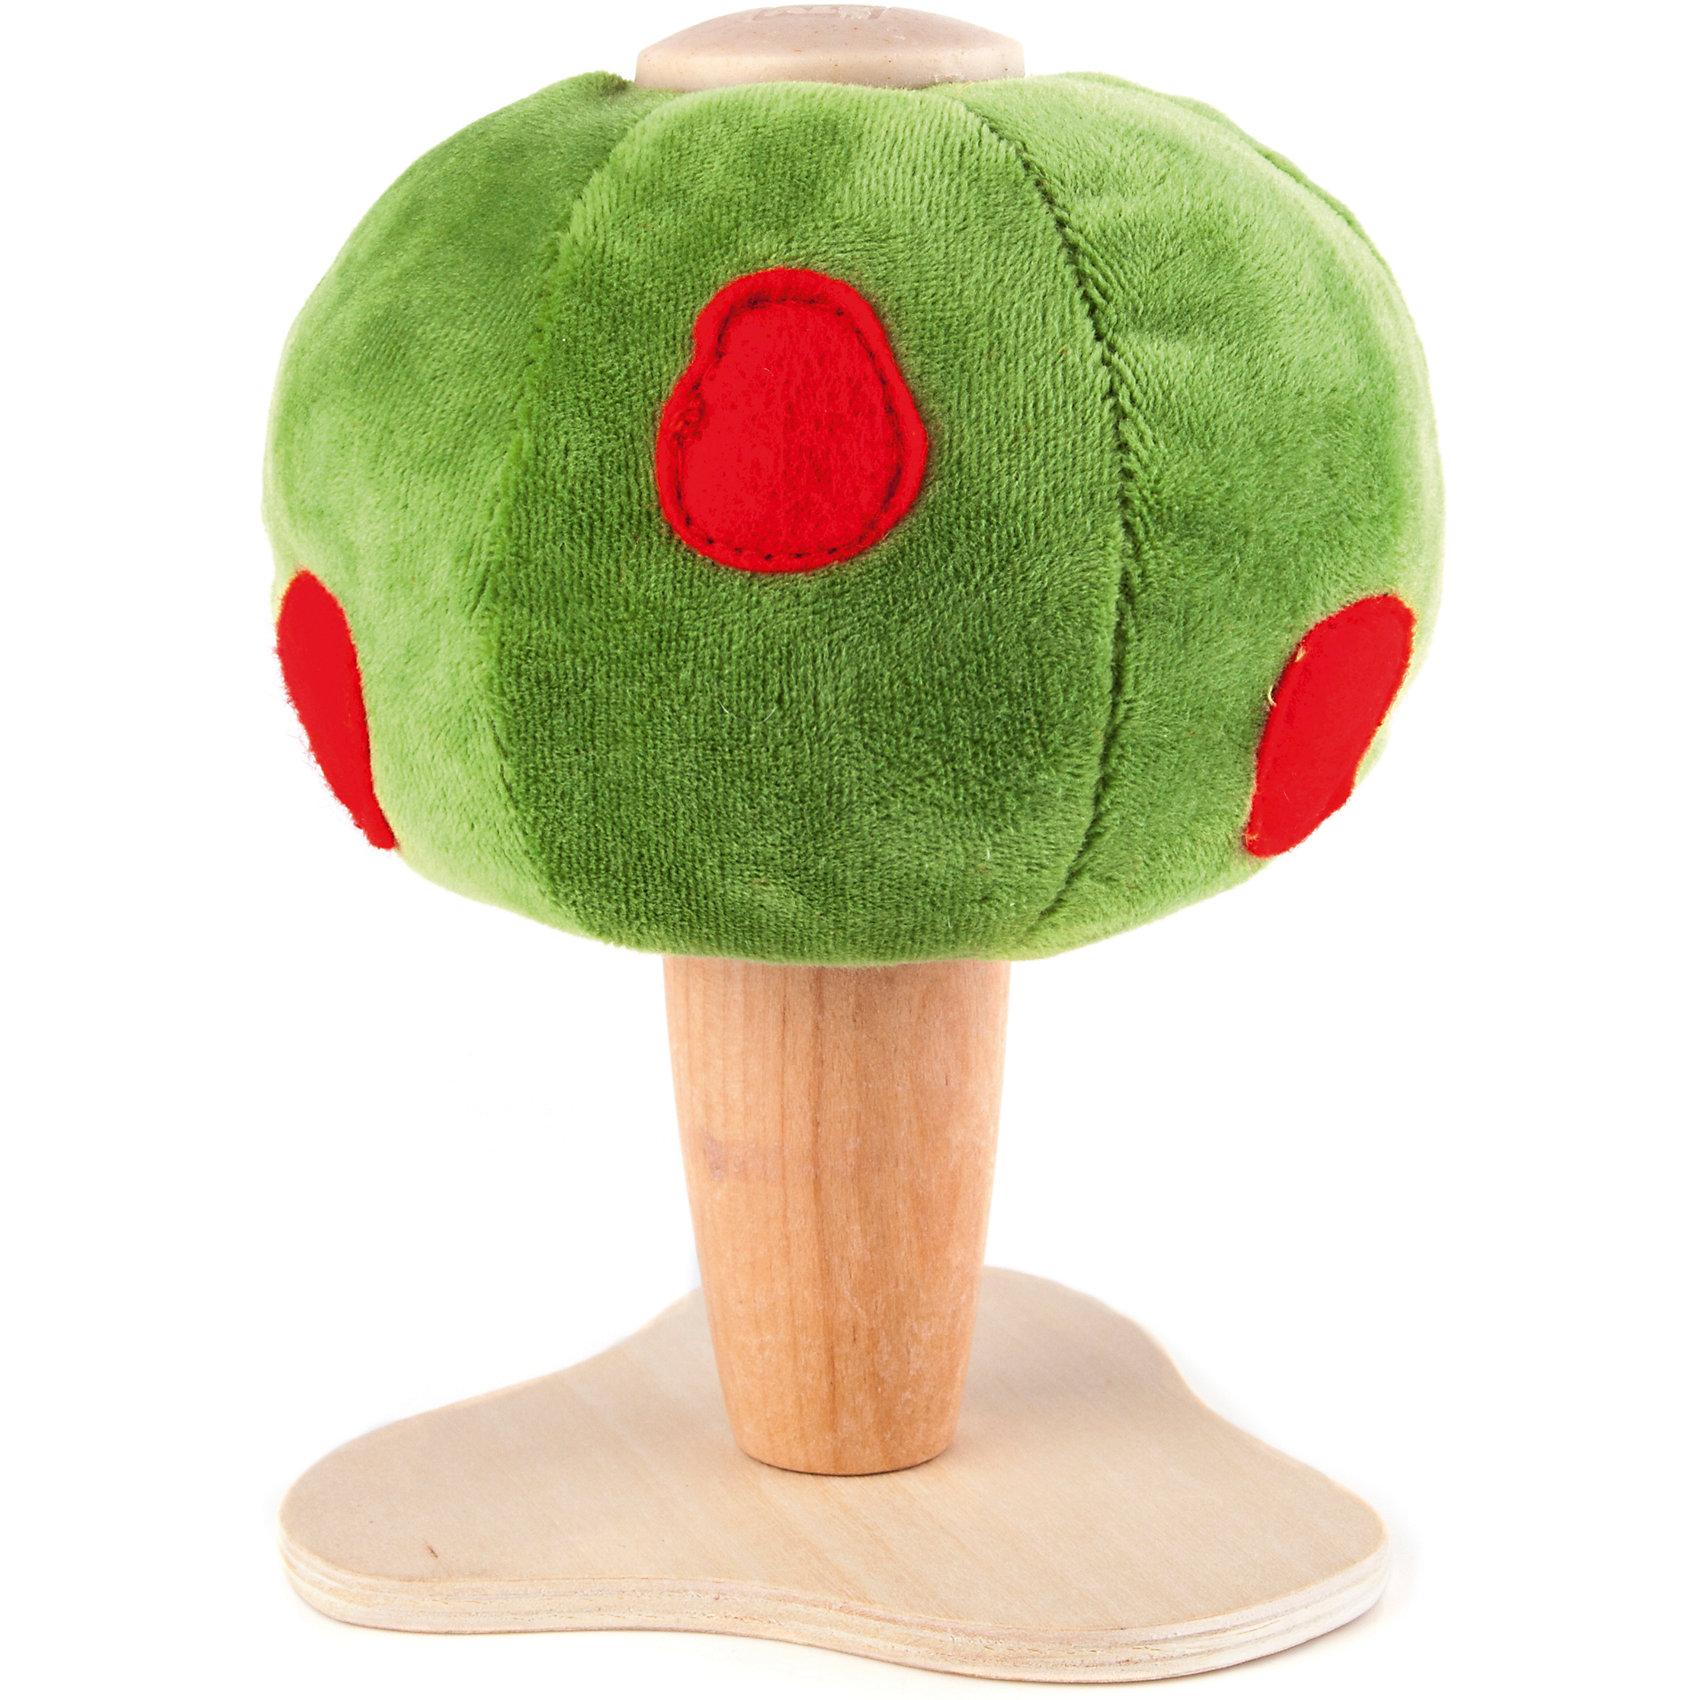 AnaMalz Яблочное дерево, AnaMalz фигурки игрушки anamalz anamalz игровое поле